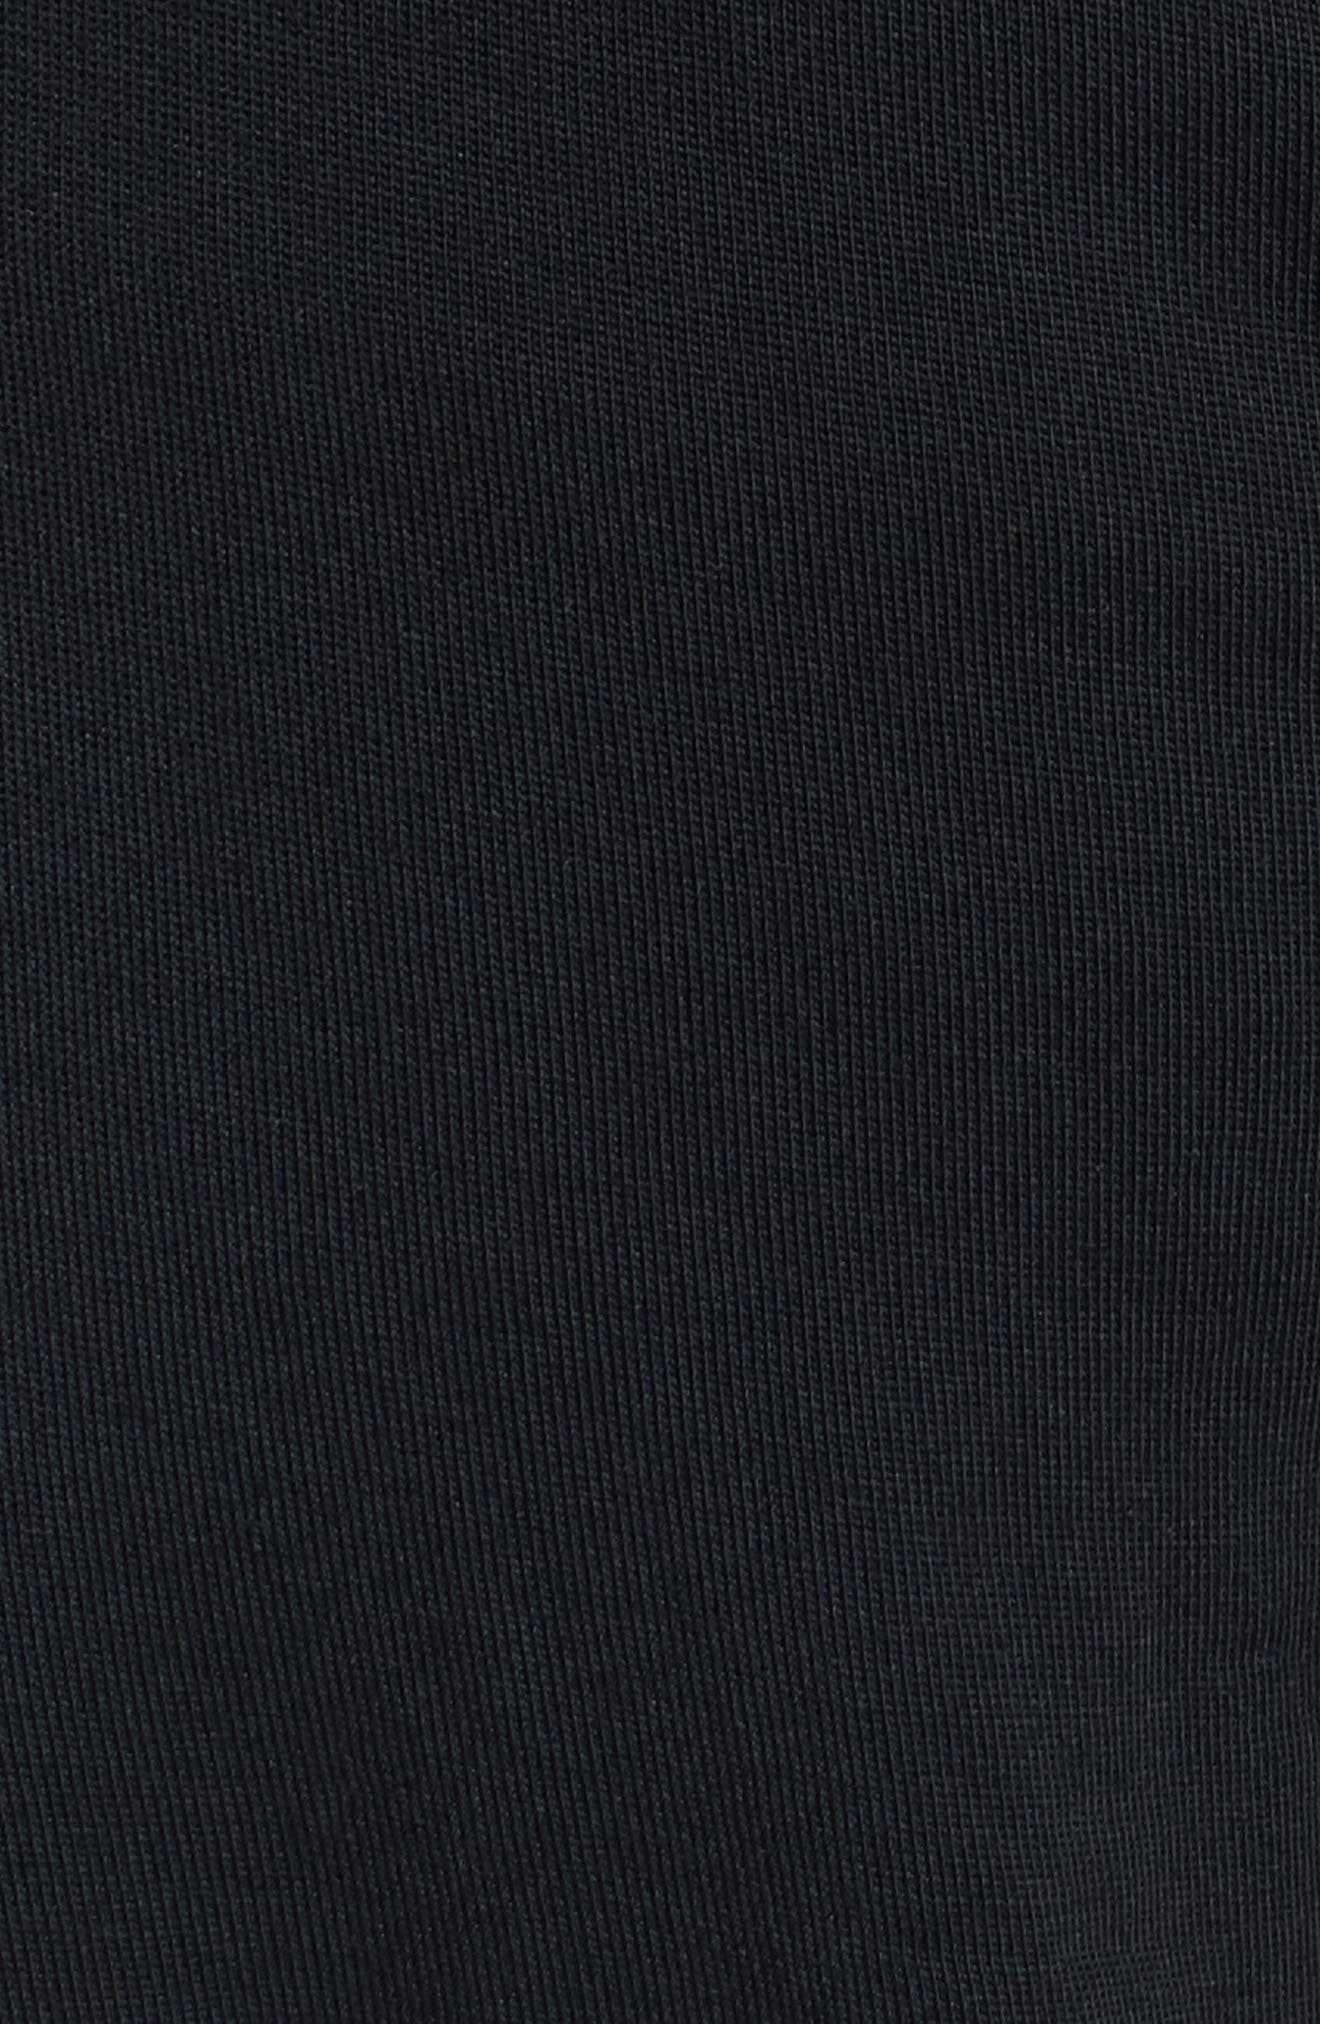 Laguna Shorts,                             Alternate thumbnail 5, color,                             Black